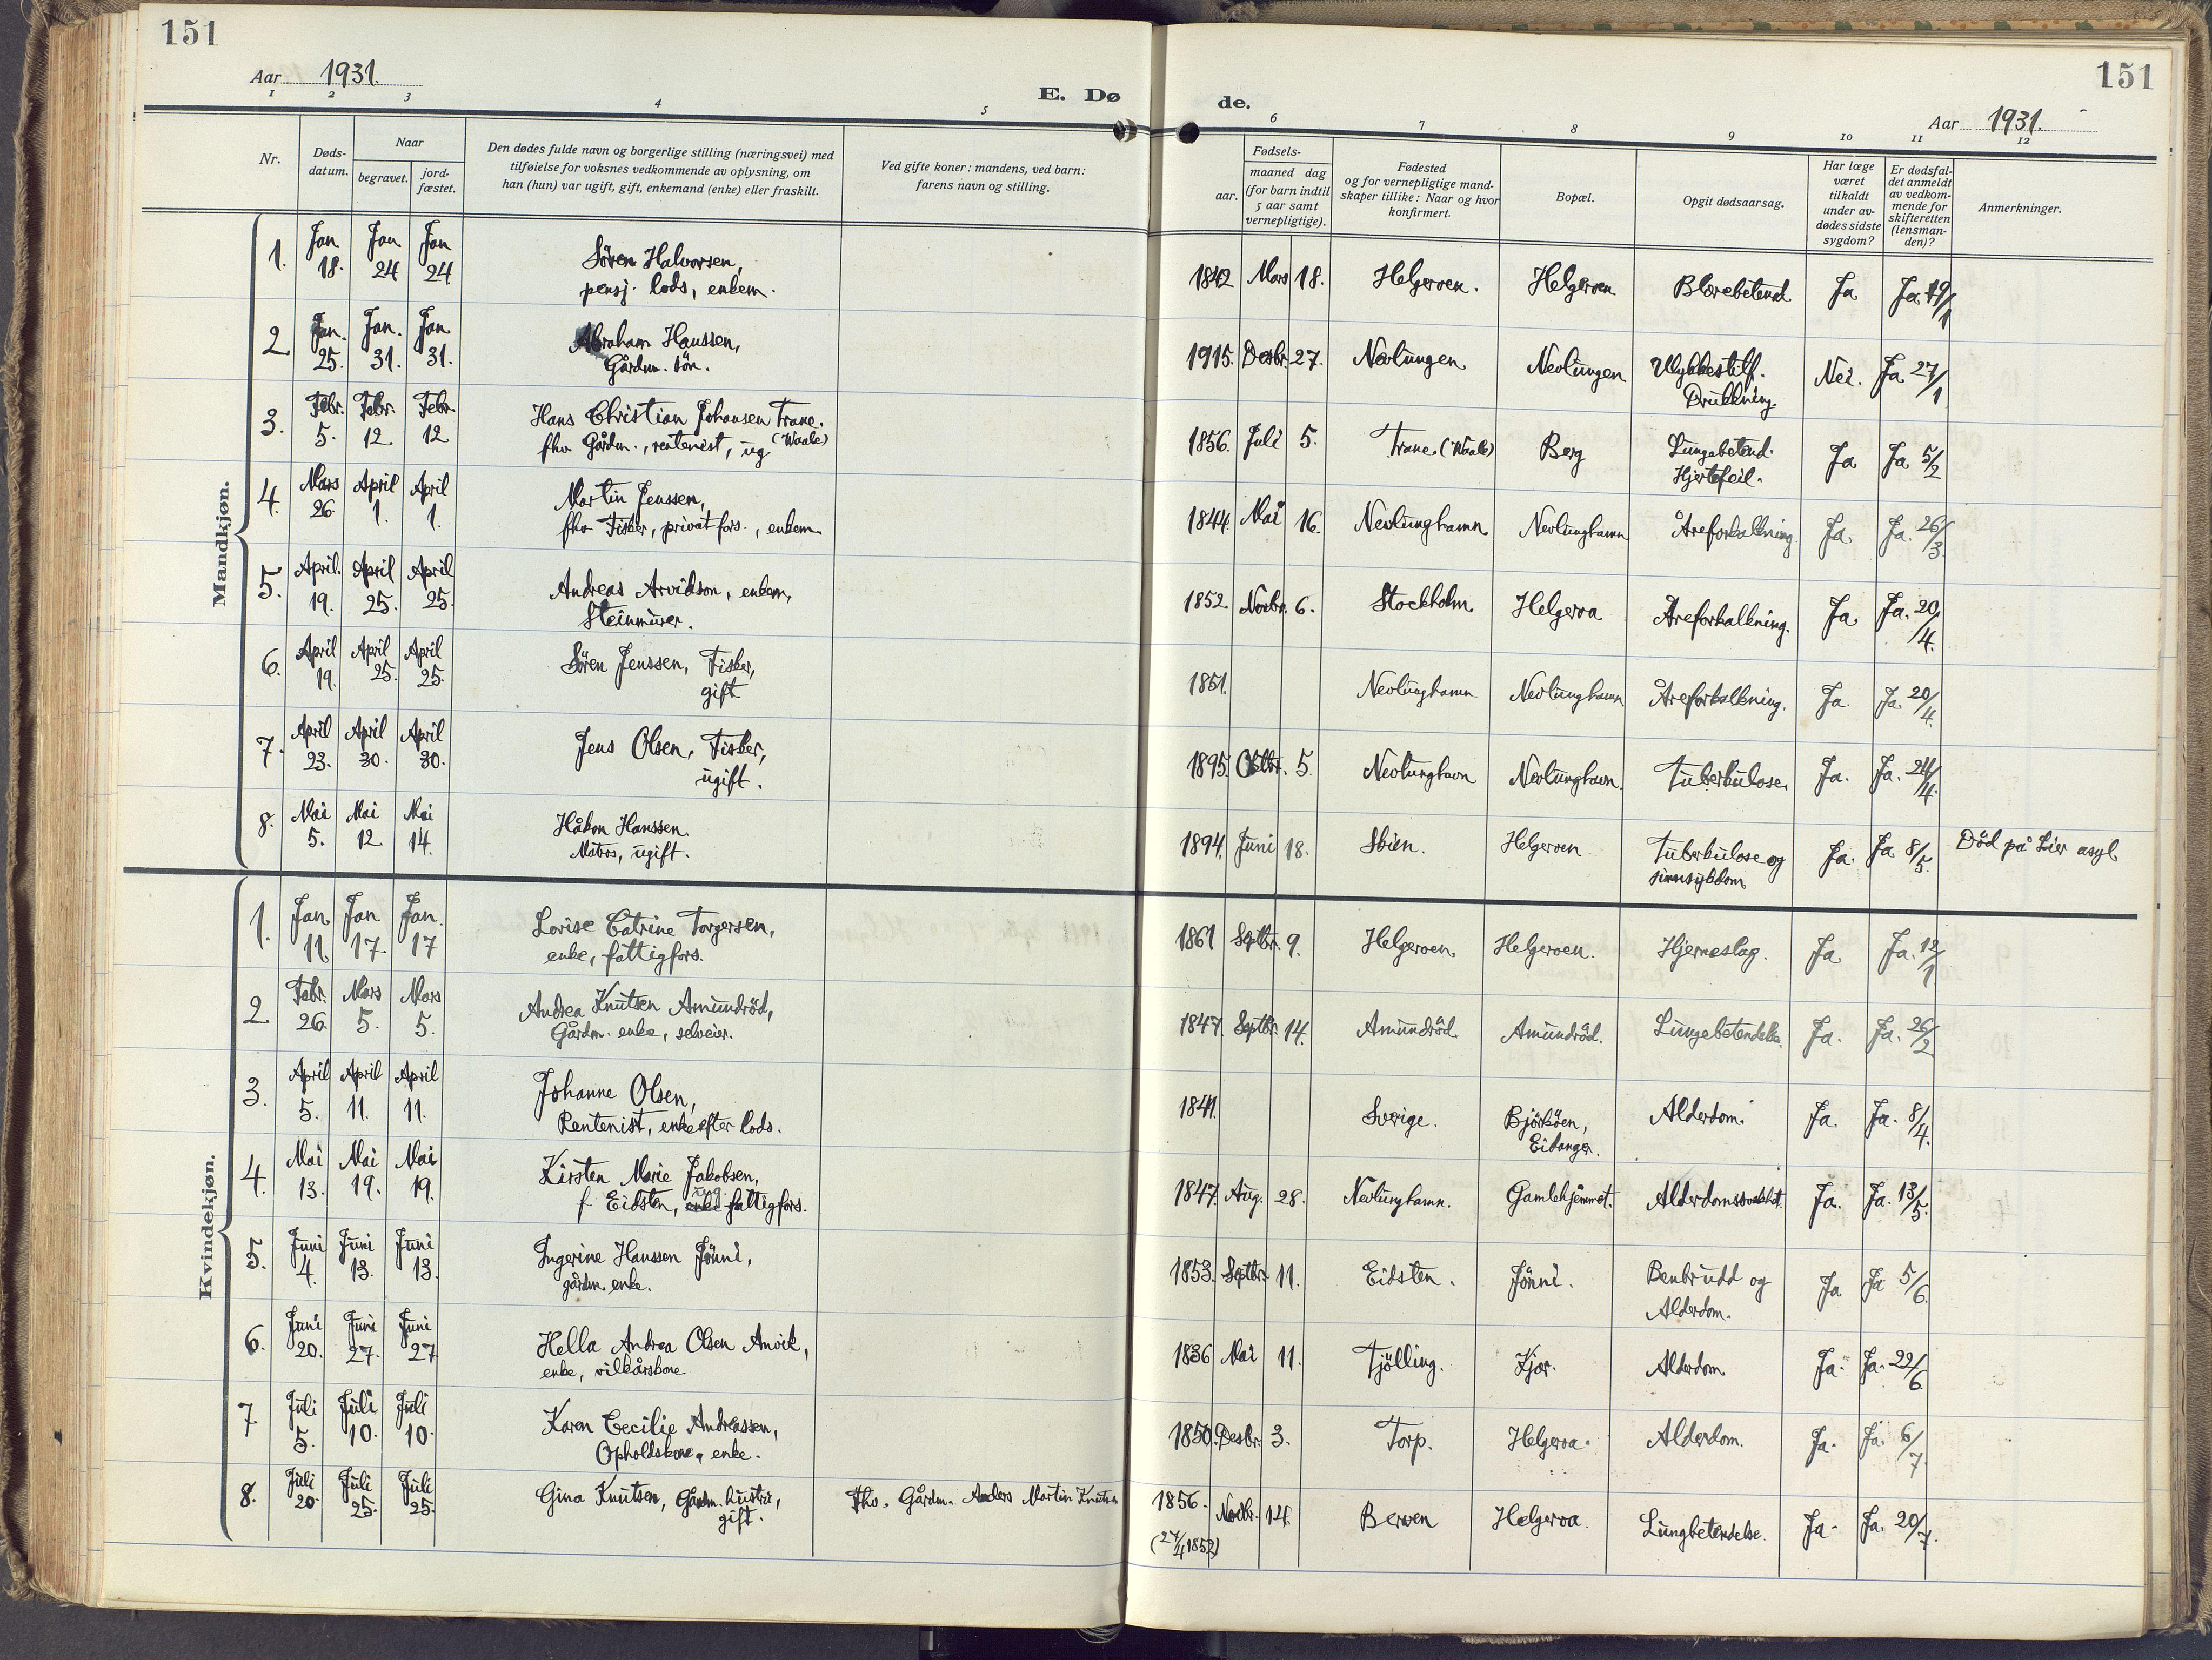 SAKO, Brunlanes kirkebøker, F/Fb/L0004: Ministerialbok nr. II 4, 1923-1940, s. 151